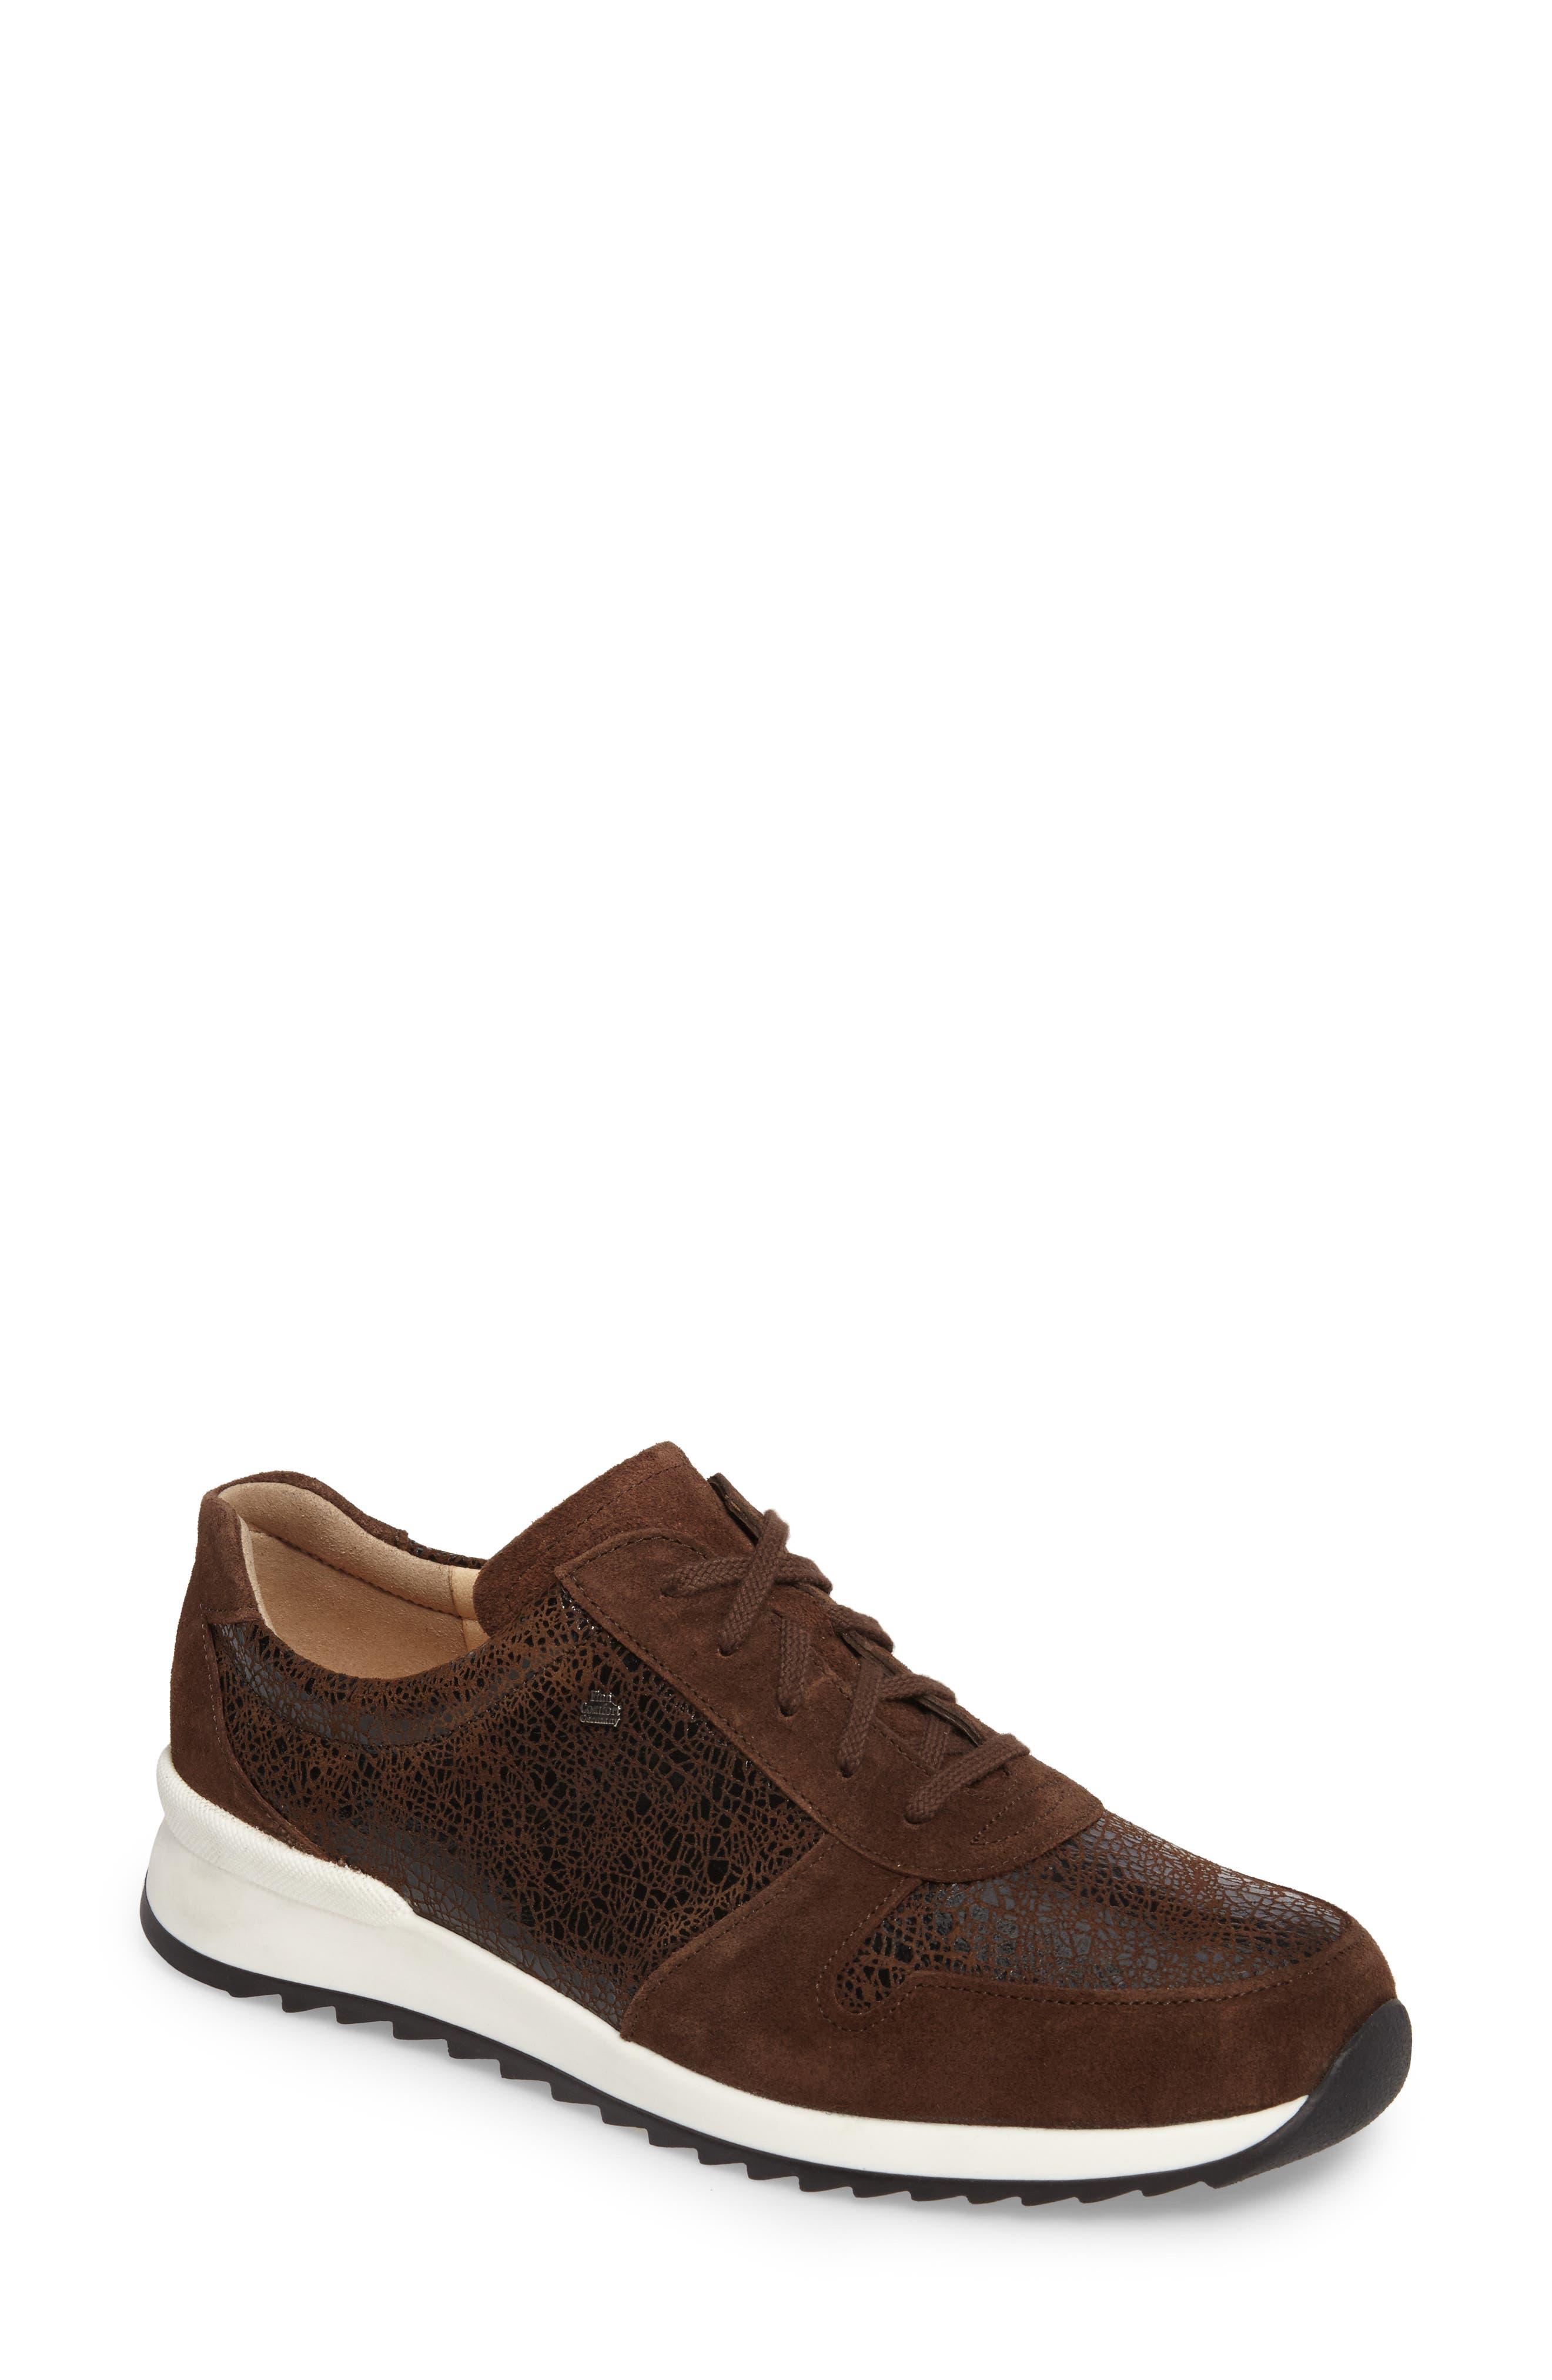 FINN COMFORT Sidonia Sneaker, Main, color, 207